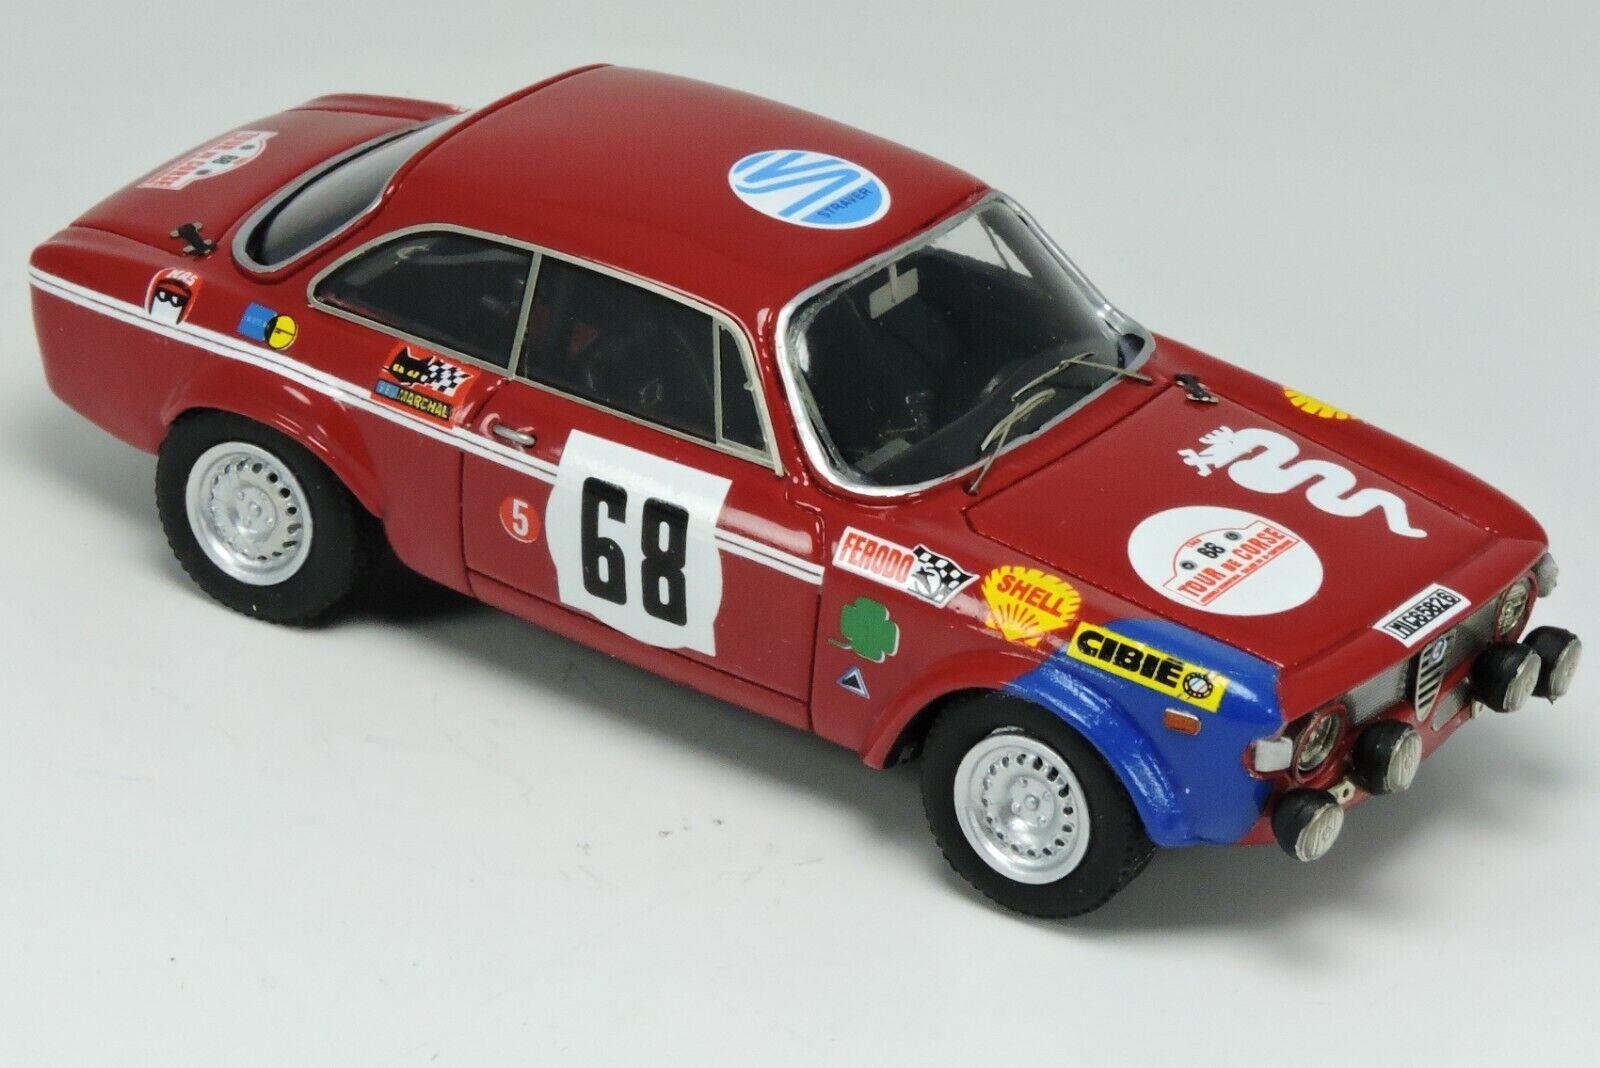 Kit Alfa Romeo Giulia Gtaj proto  68 Tour de Corse 1969 - Arena Modells kit 1 43